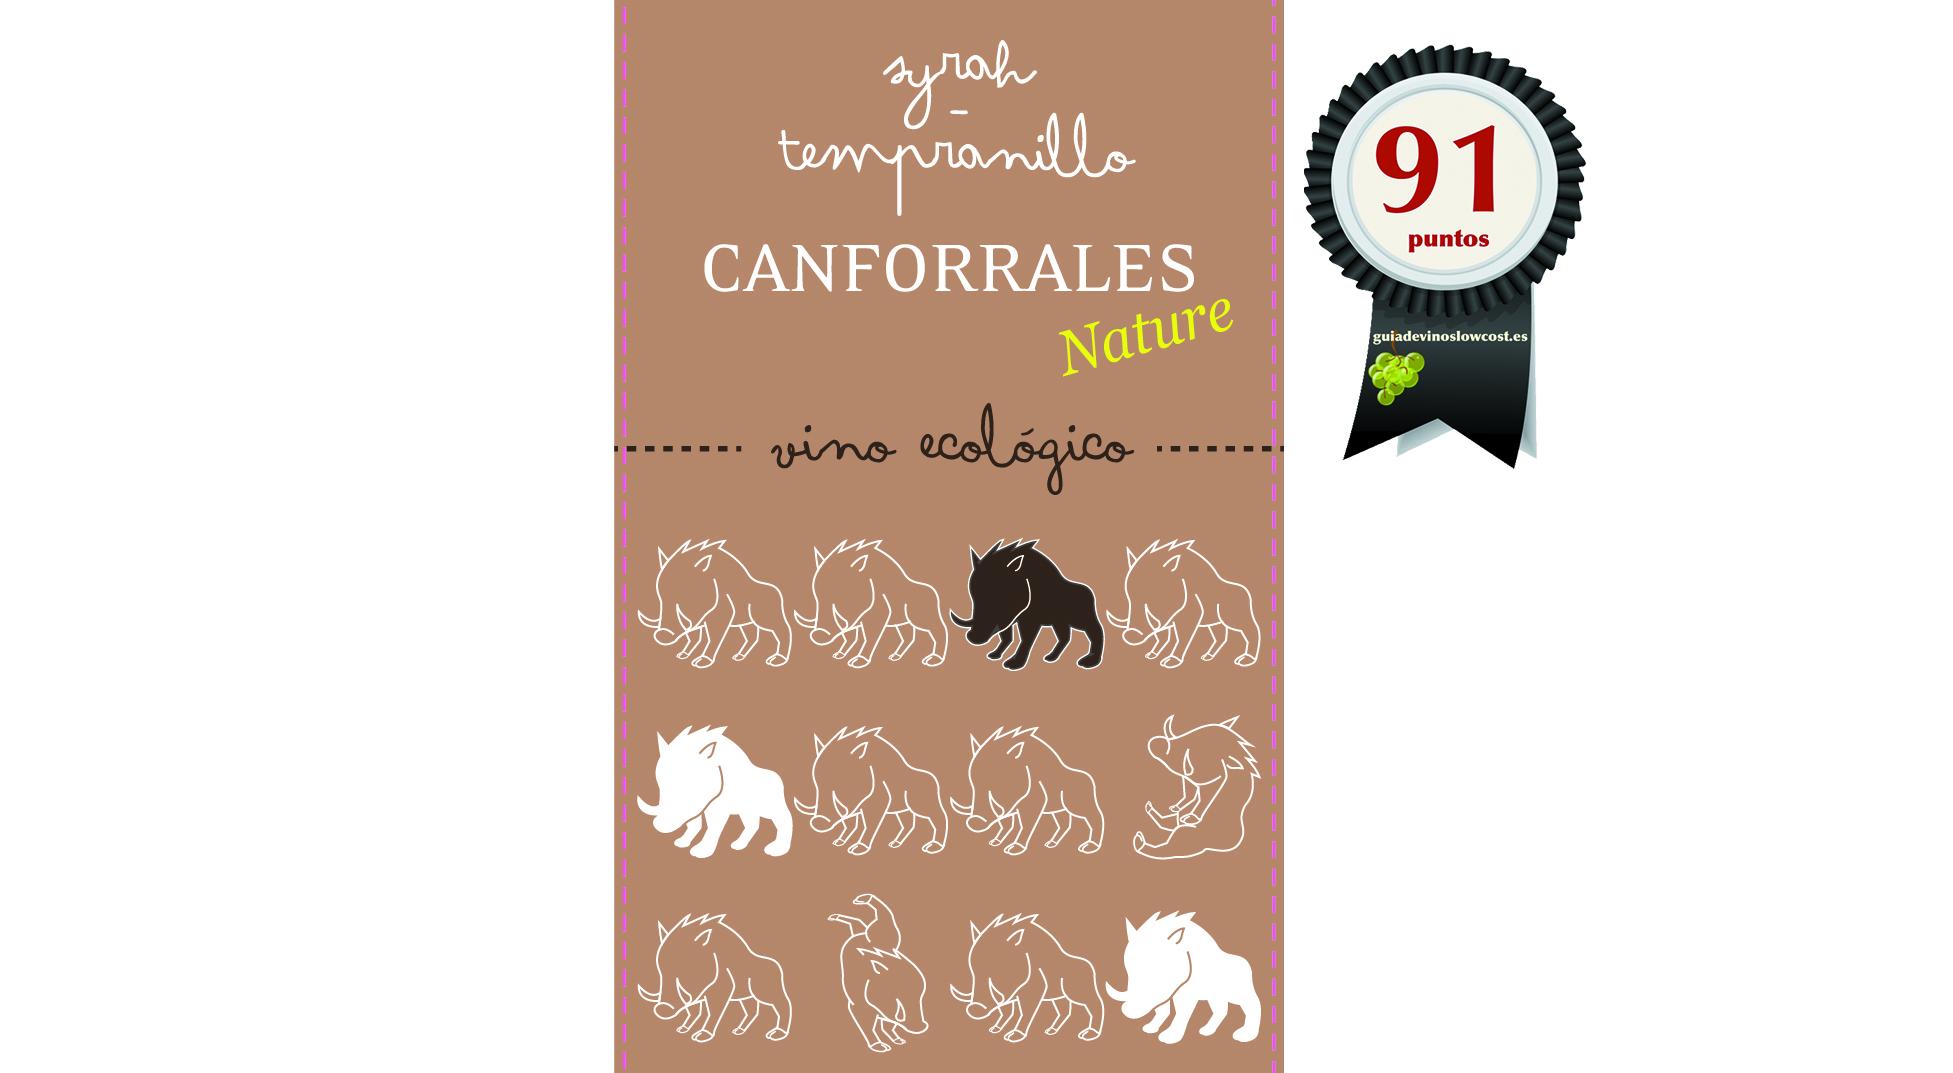 Canforrales Ecológico Tinto 2018